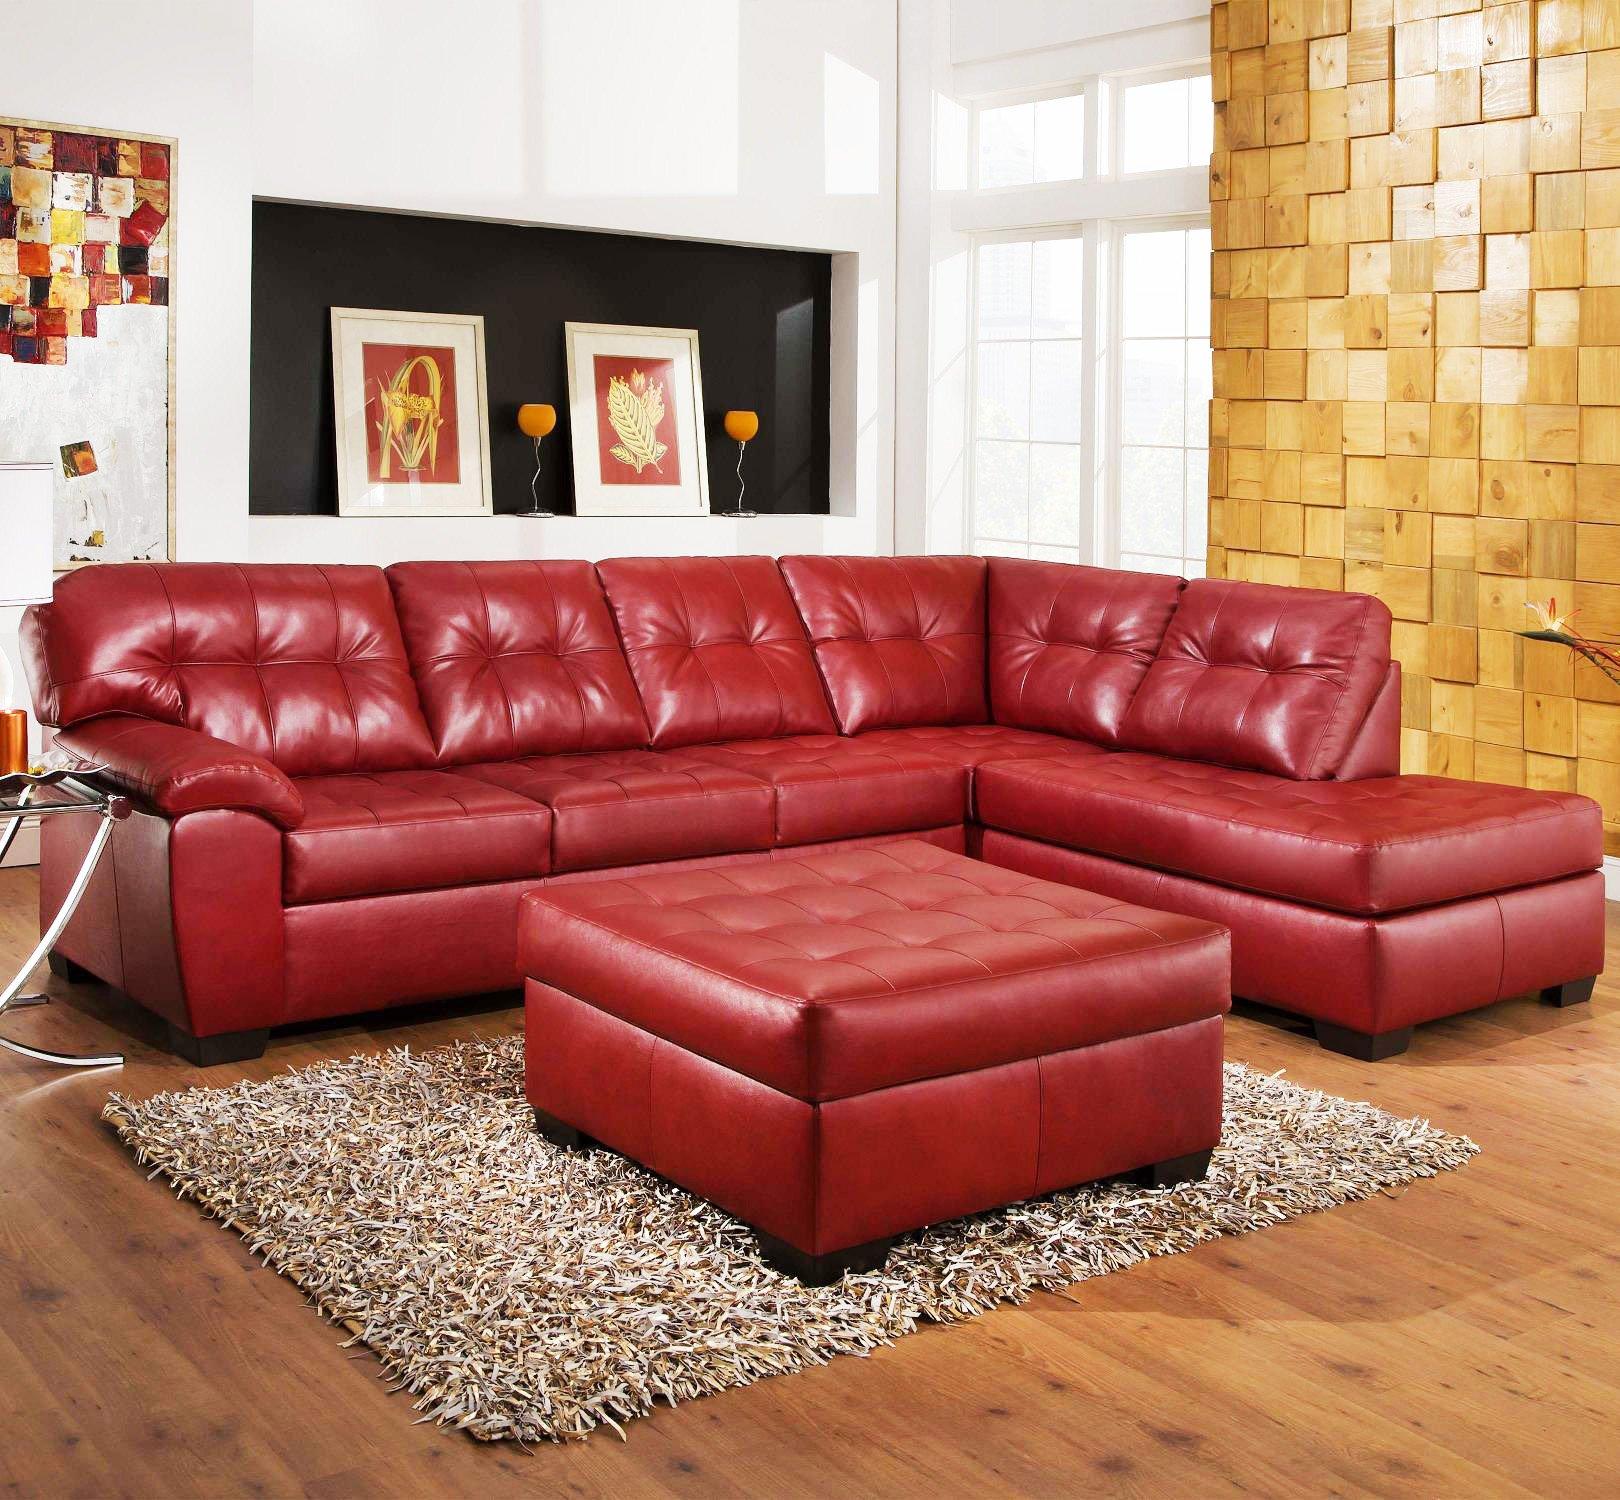 Roundhill Furniture Addiya 3-Piece Bonded Leather Sectional Sofa ...